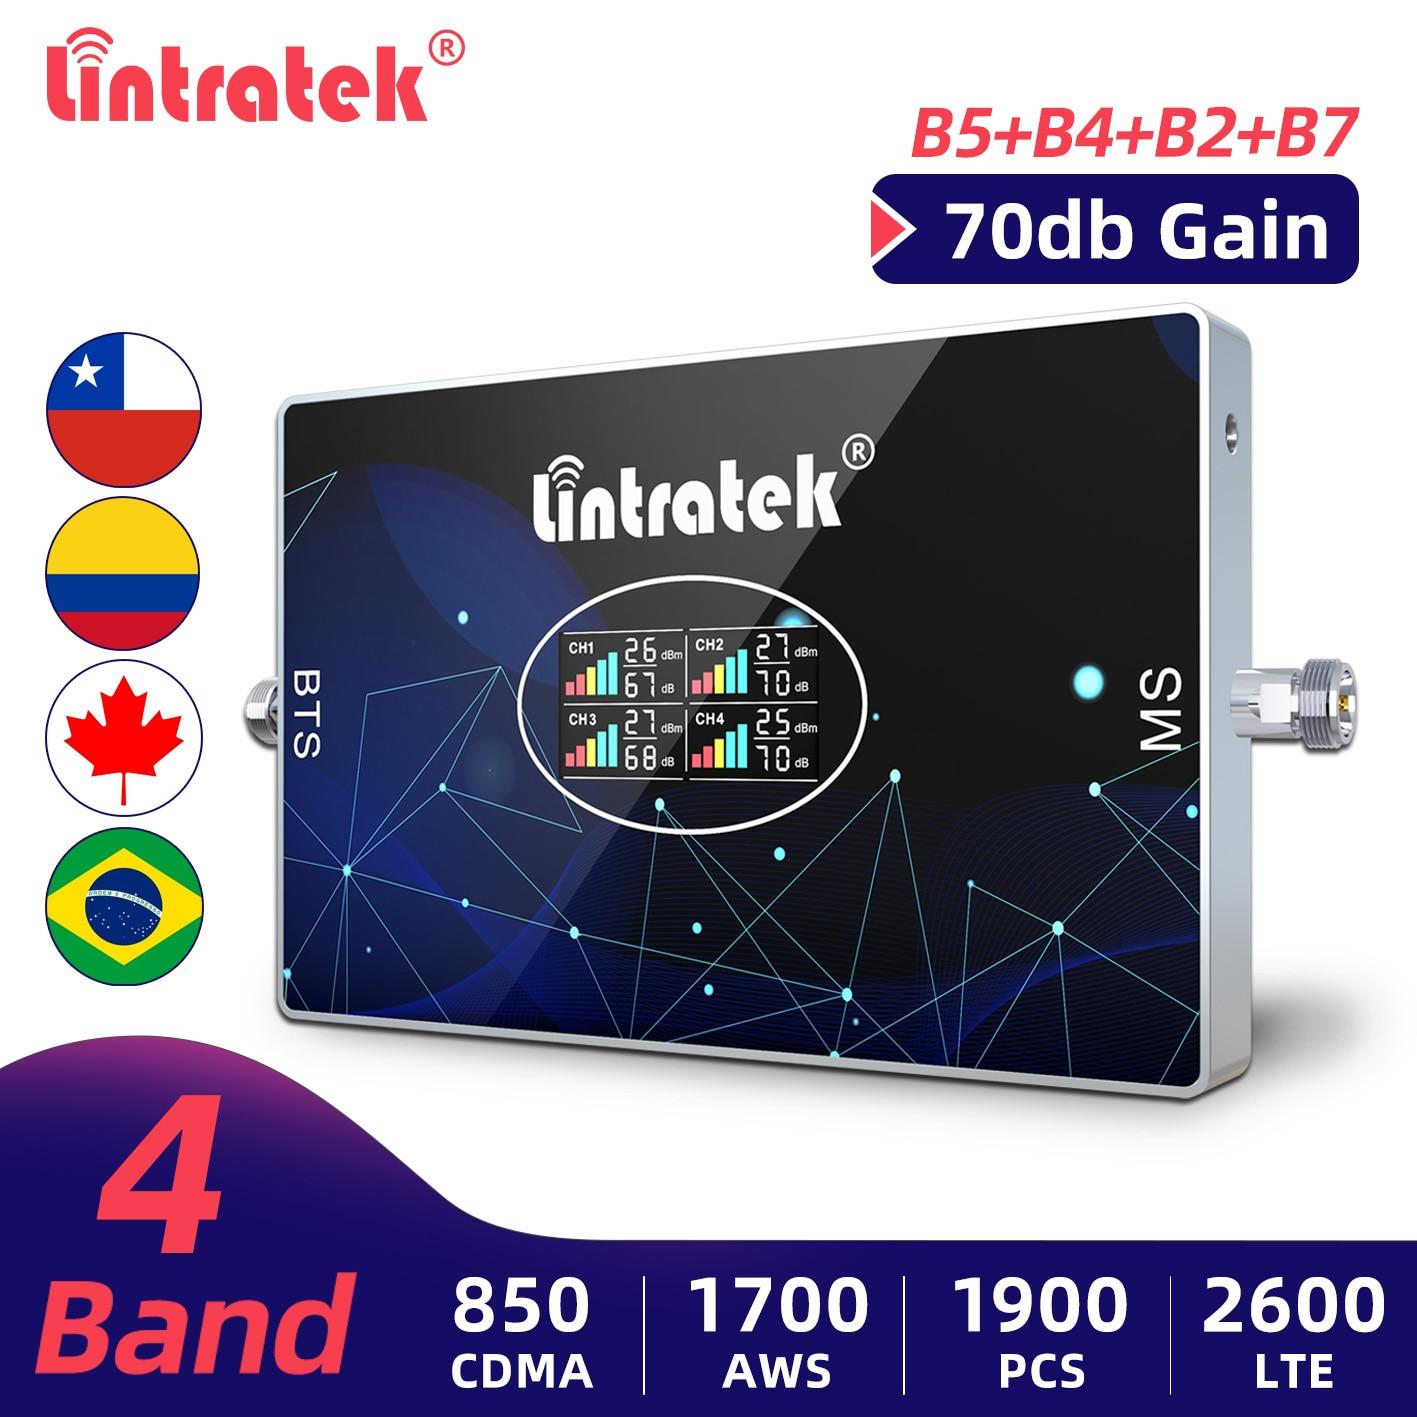 Lintratek 4G الهاتف المحمول مكرر إشارة 2G 3G 850 1700 1900 CDMA قطعة AWS الداعم B7 2600mhz LTE الخلوية مكبر للصوت 4 الفرقة الداعم